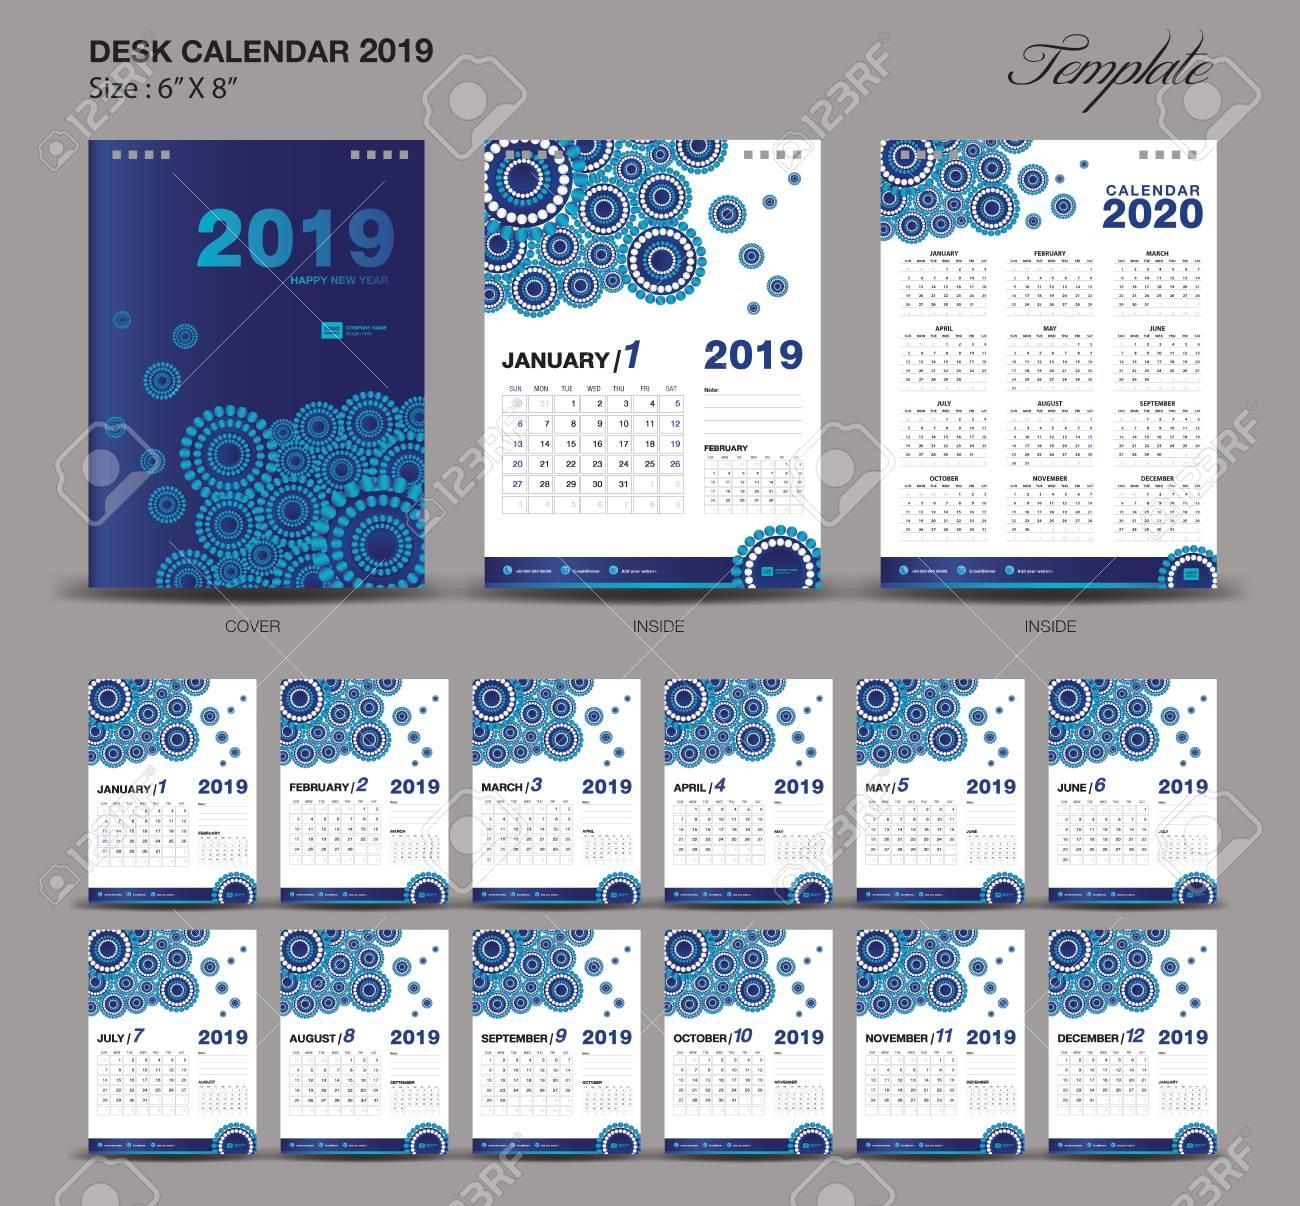 Desk Calendar 2019 Year Size 6 X 8 Inch Template Blue Calendar 2019